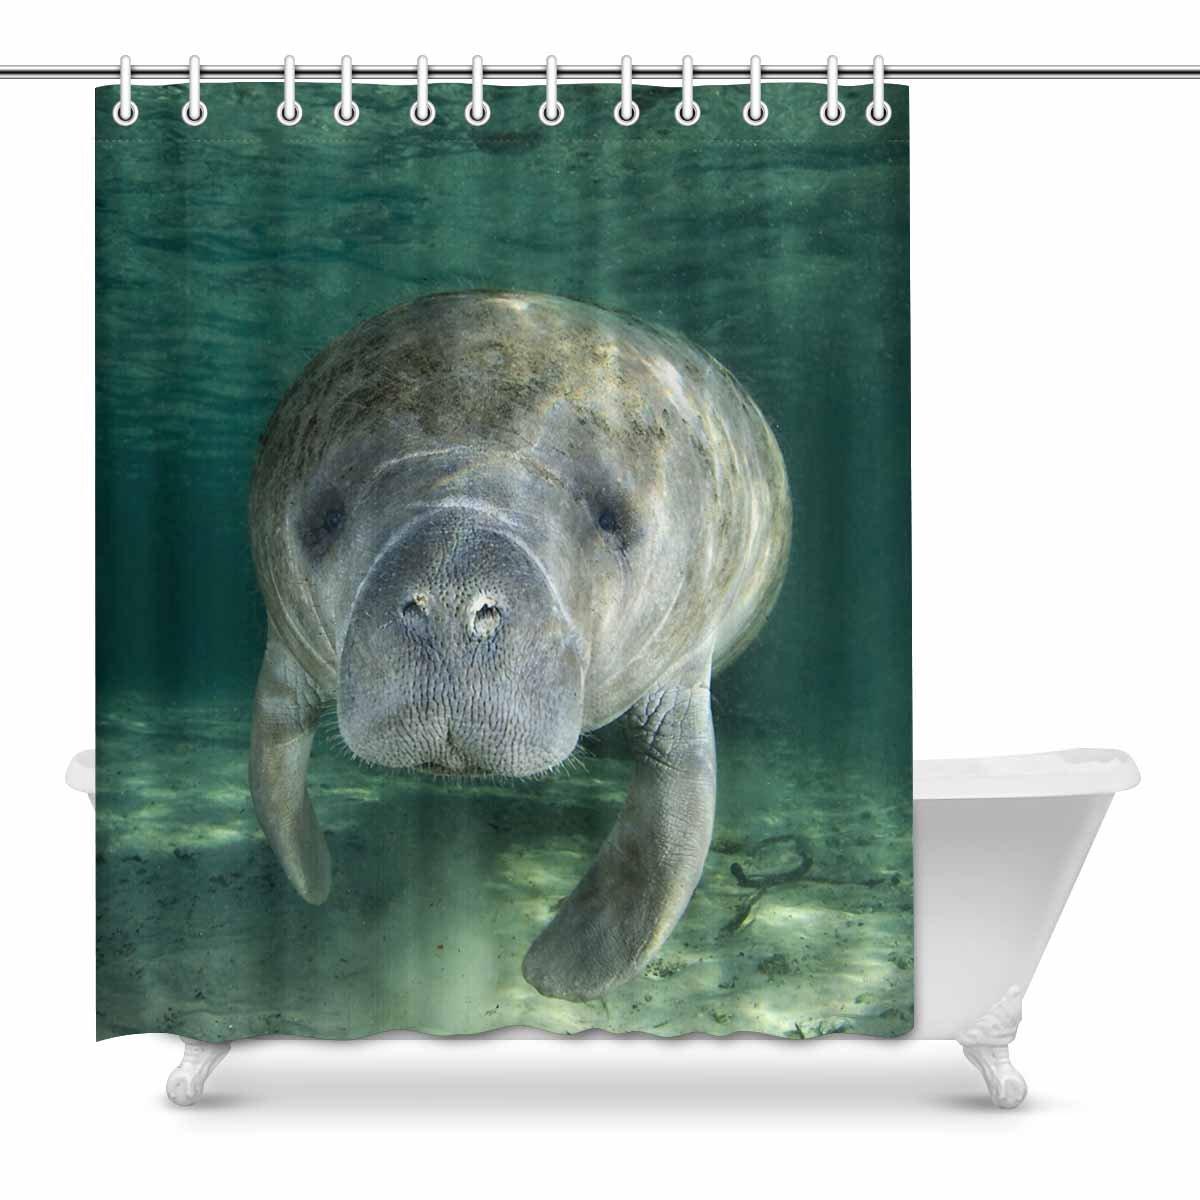 mkhert funny cute manatee wild animal waterproof polyester fabric shower curtain bathroom sets home decor 60x72 inch walmart com